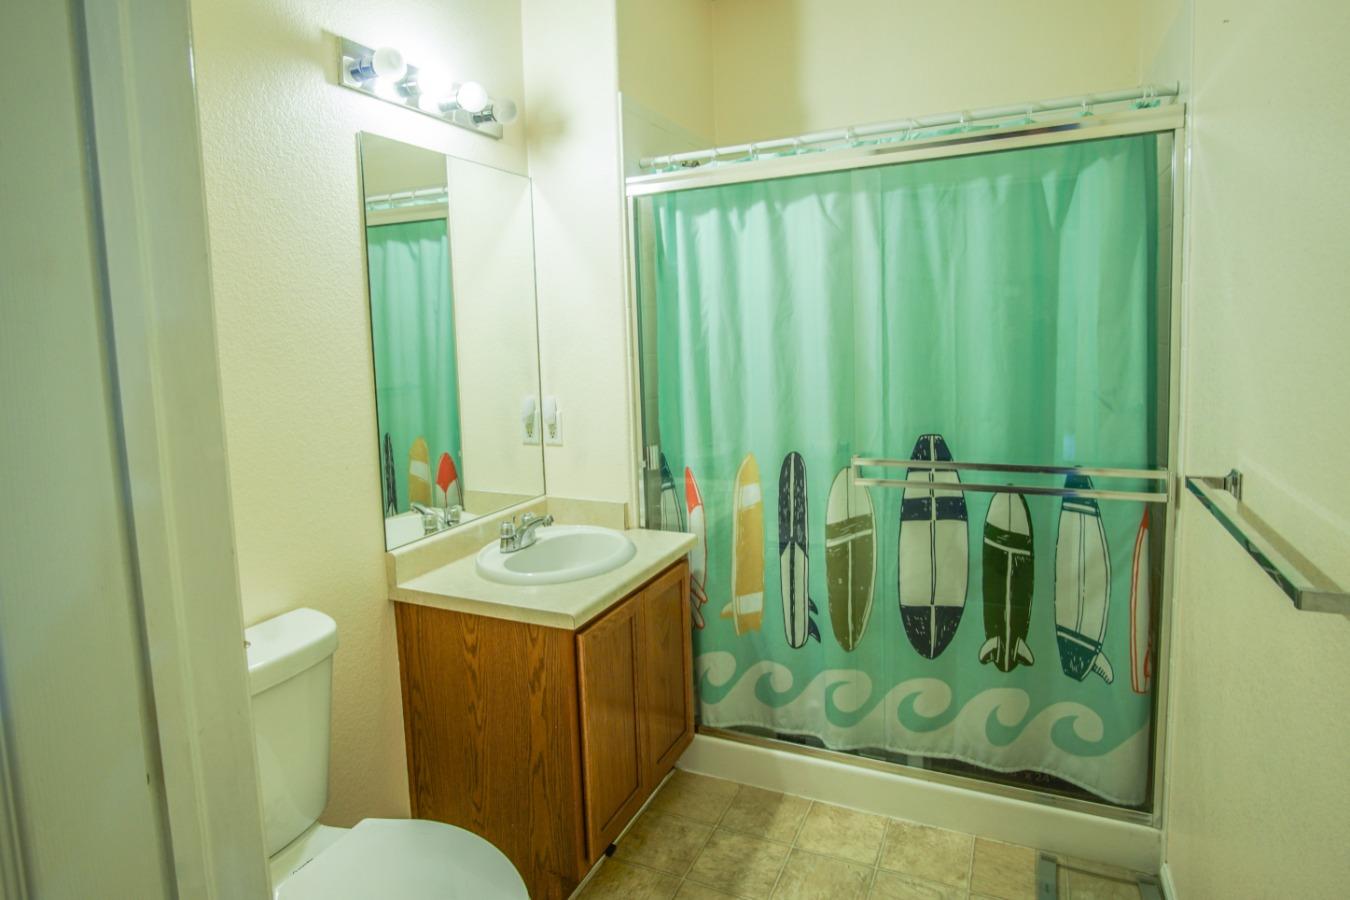 3/4 guest bathroom